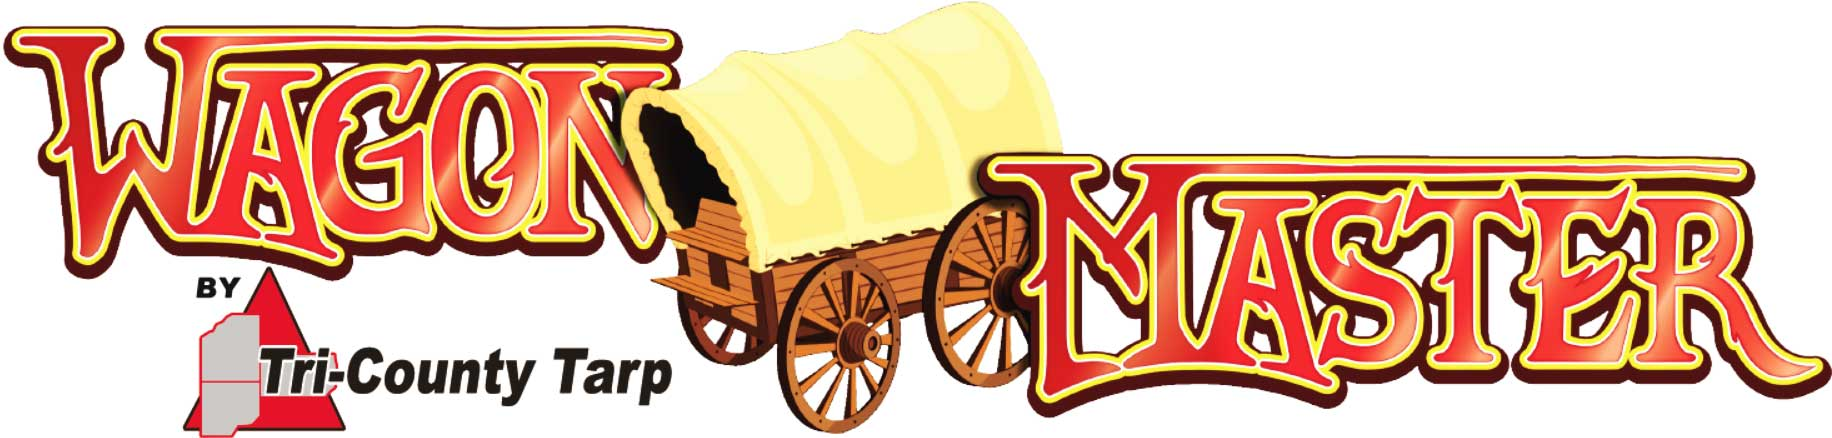 Wagon Master Tarp System